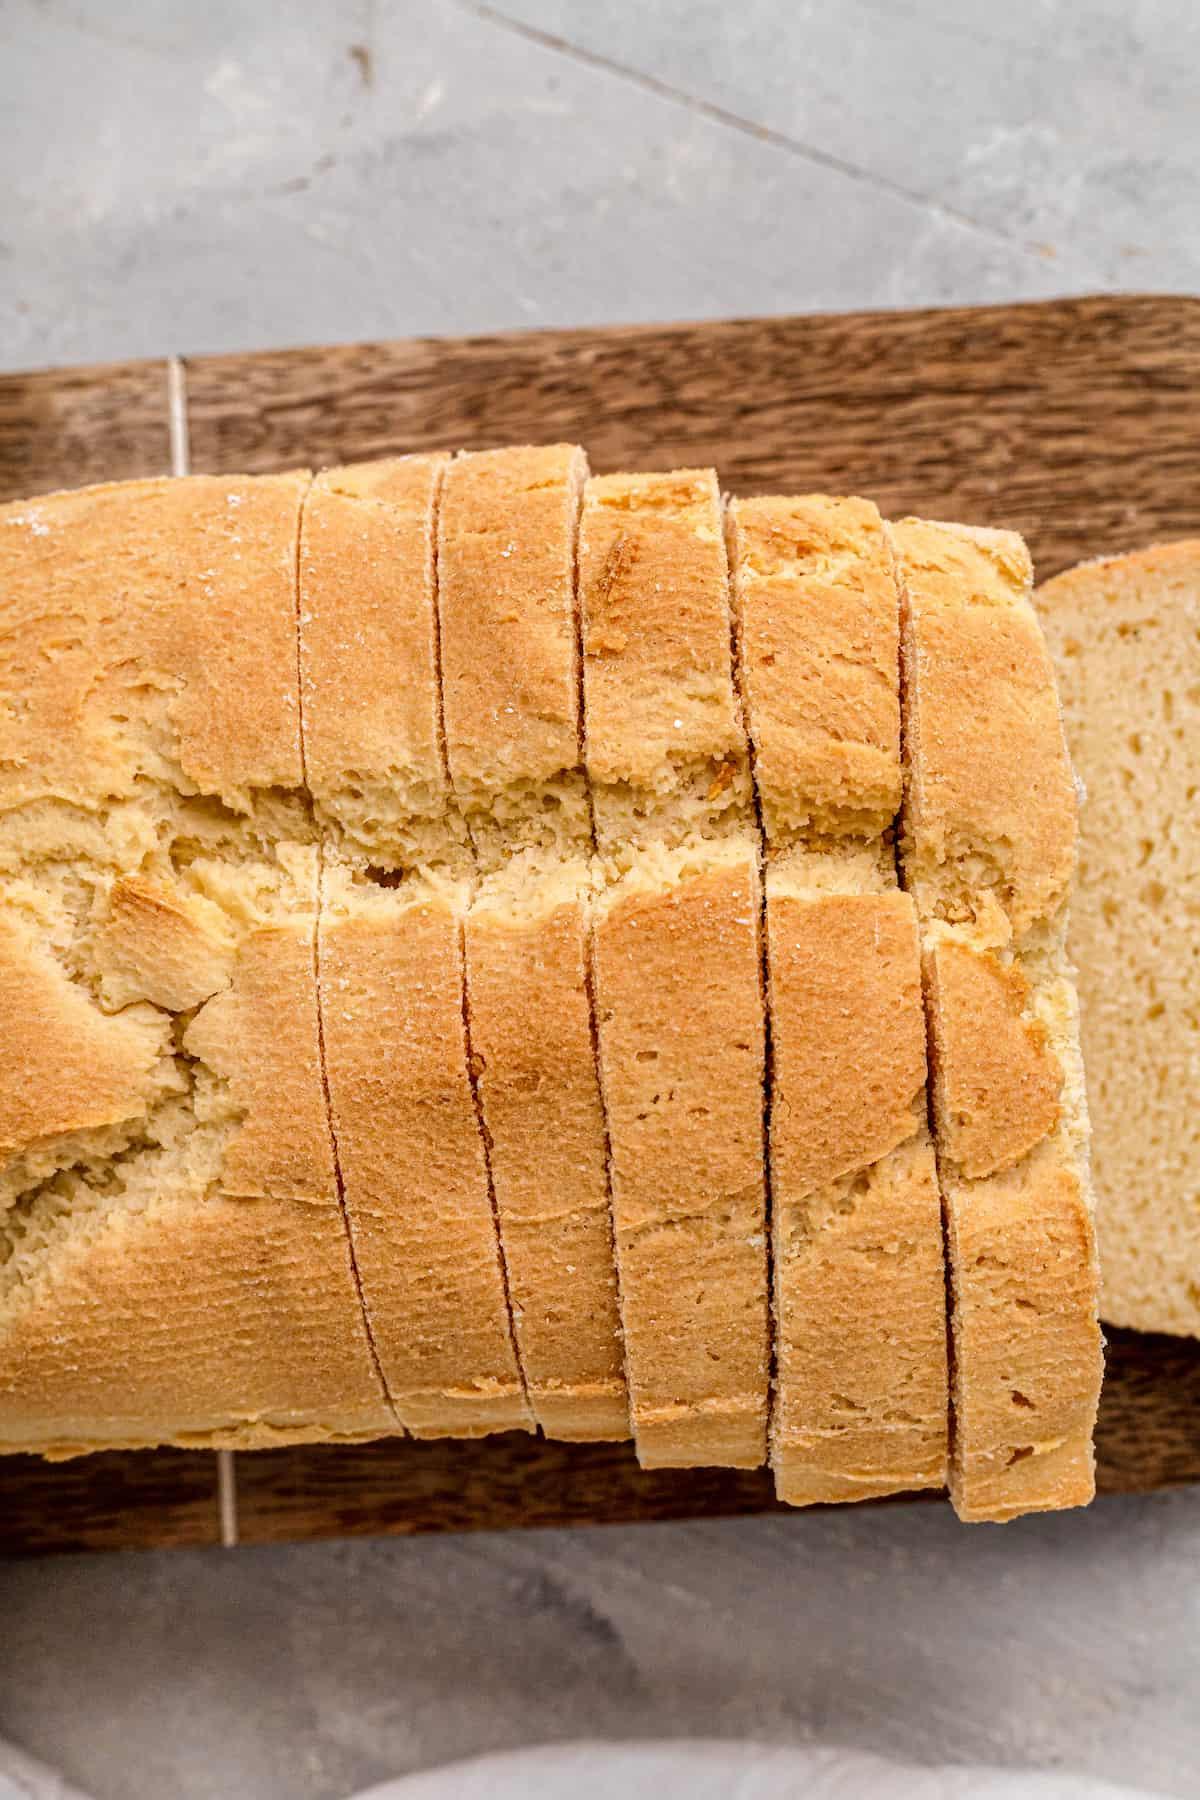 slices of gluten free sandwich loaf on a wooden board